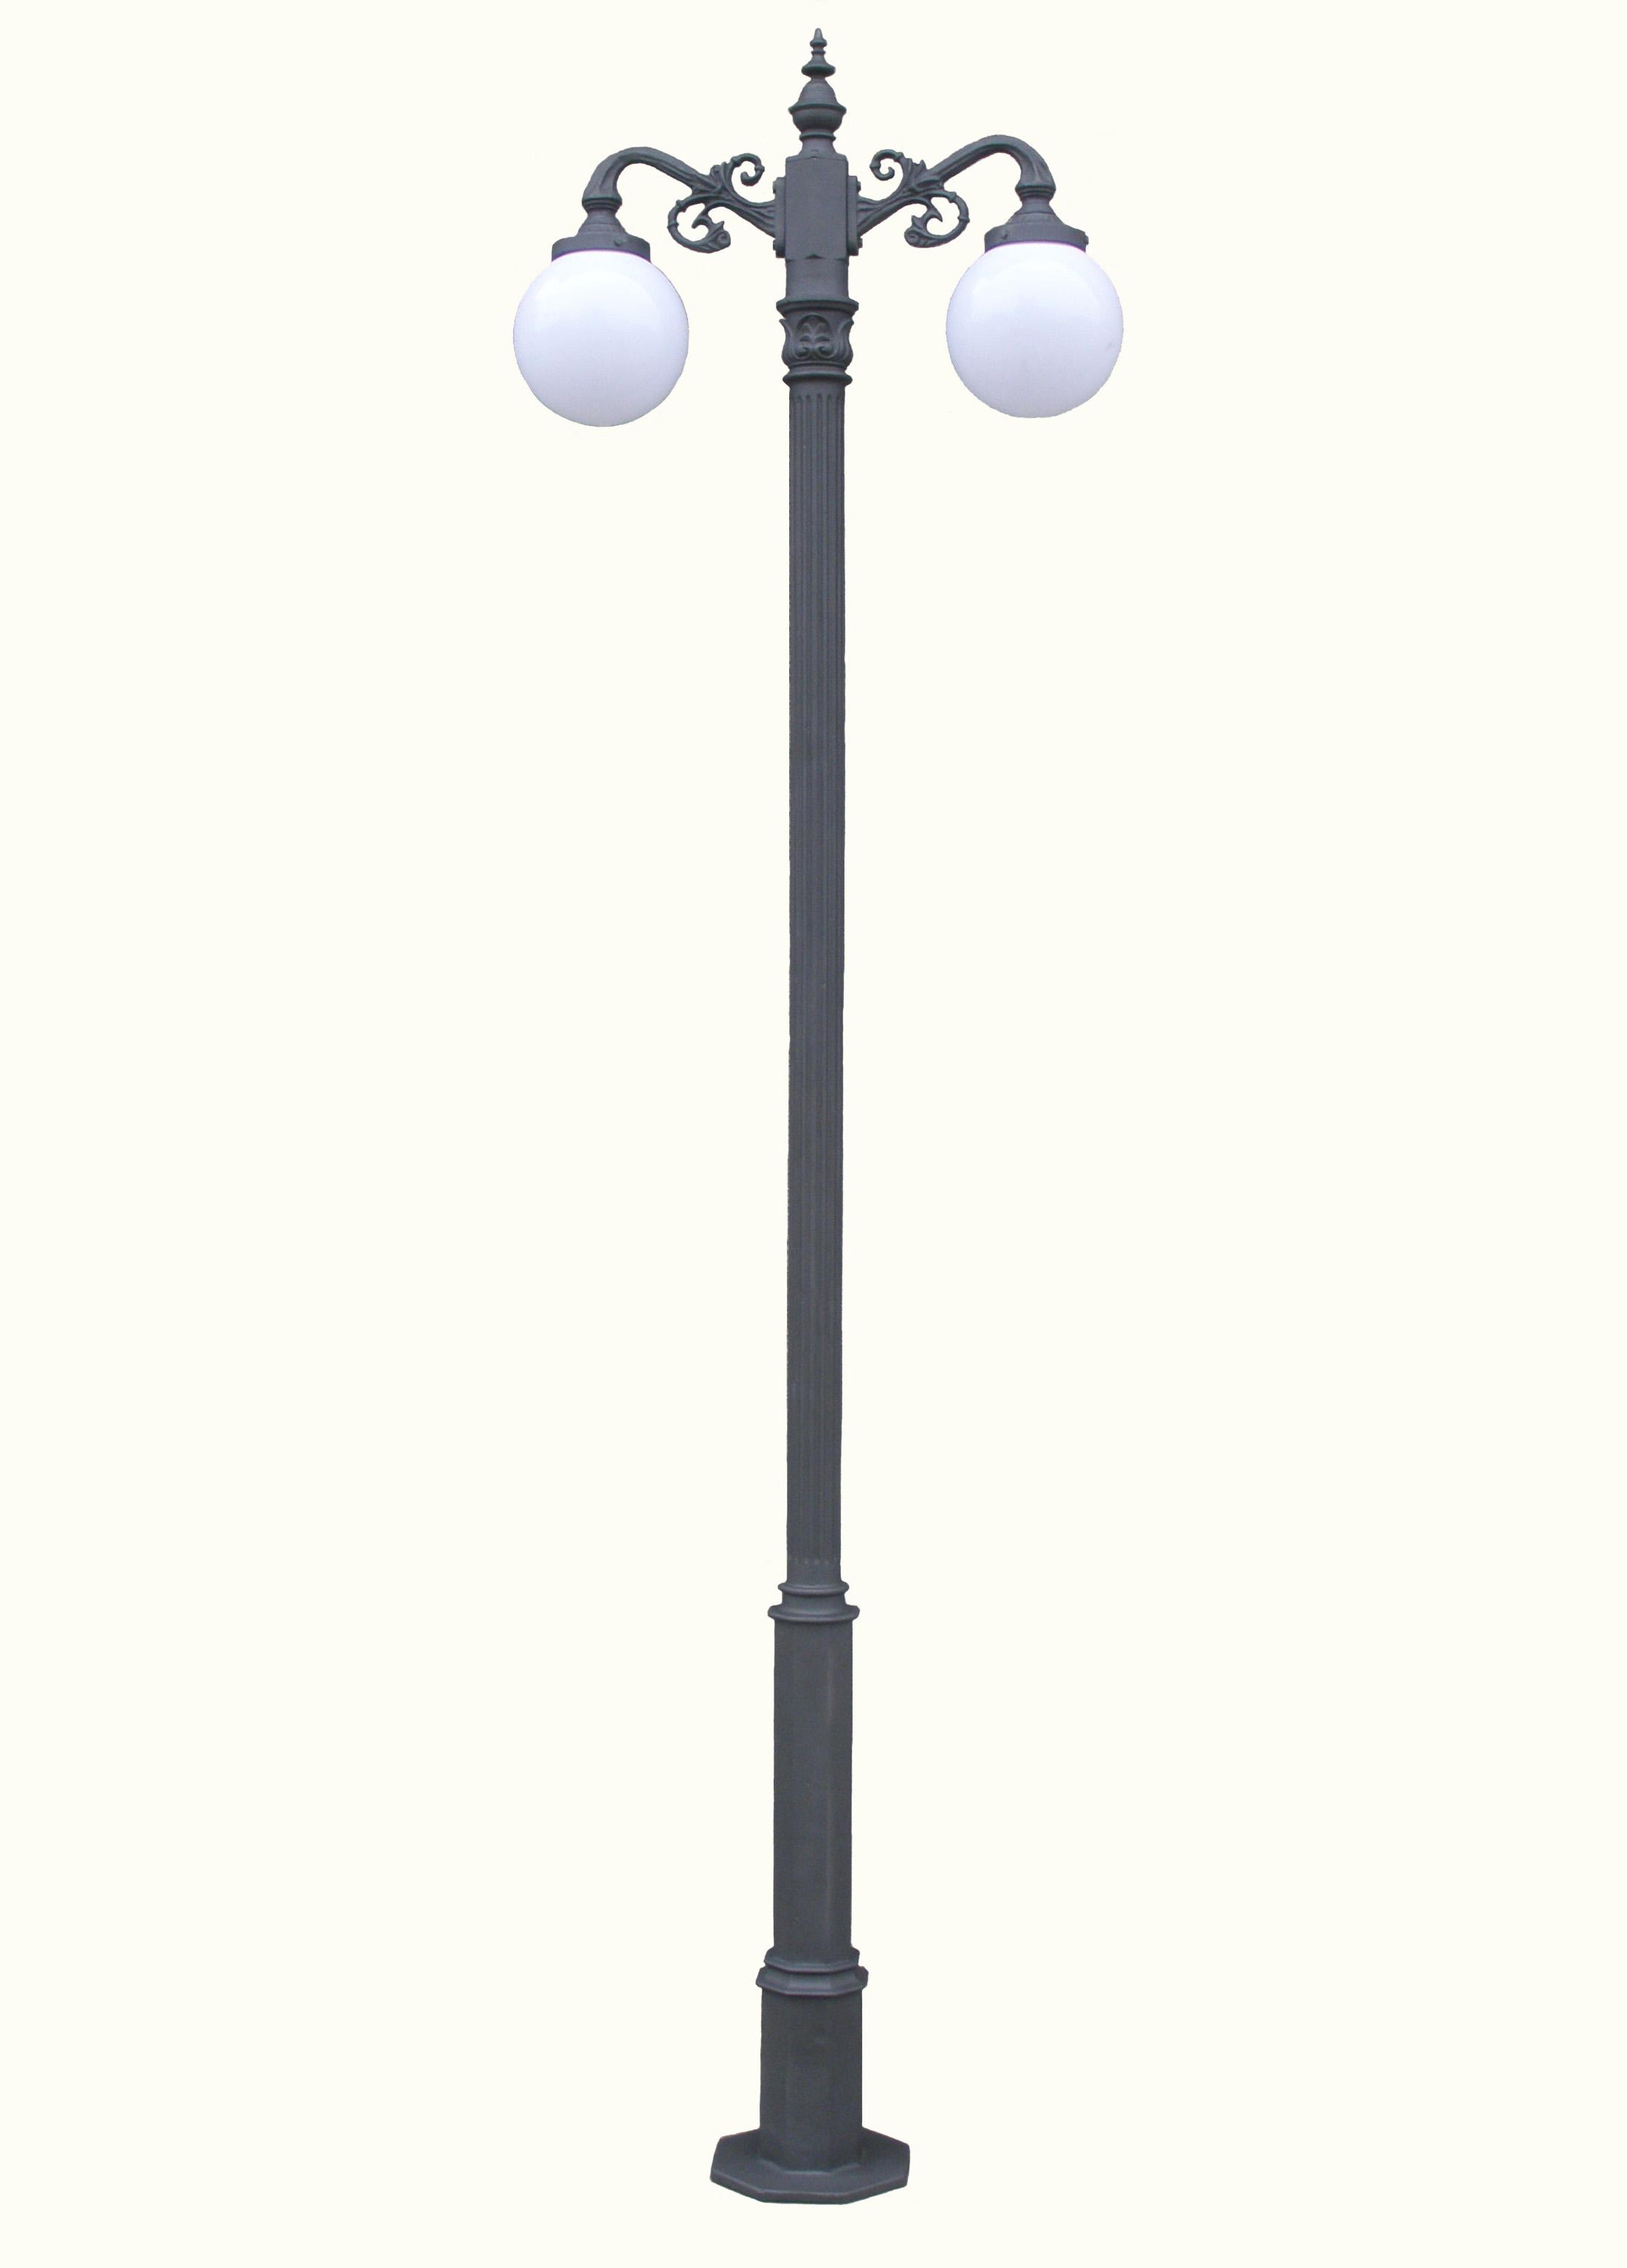 Stalpi ornamentali pentru iluminat stradal, parcuri, gradini BRAMAL LIGHT - Poza 16